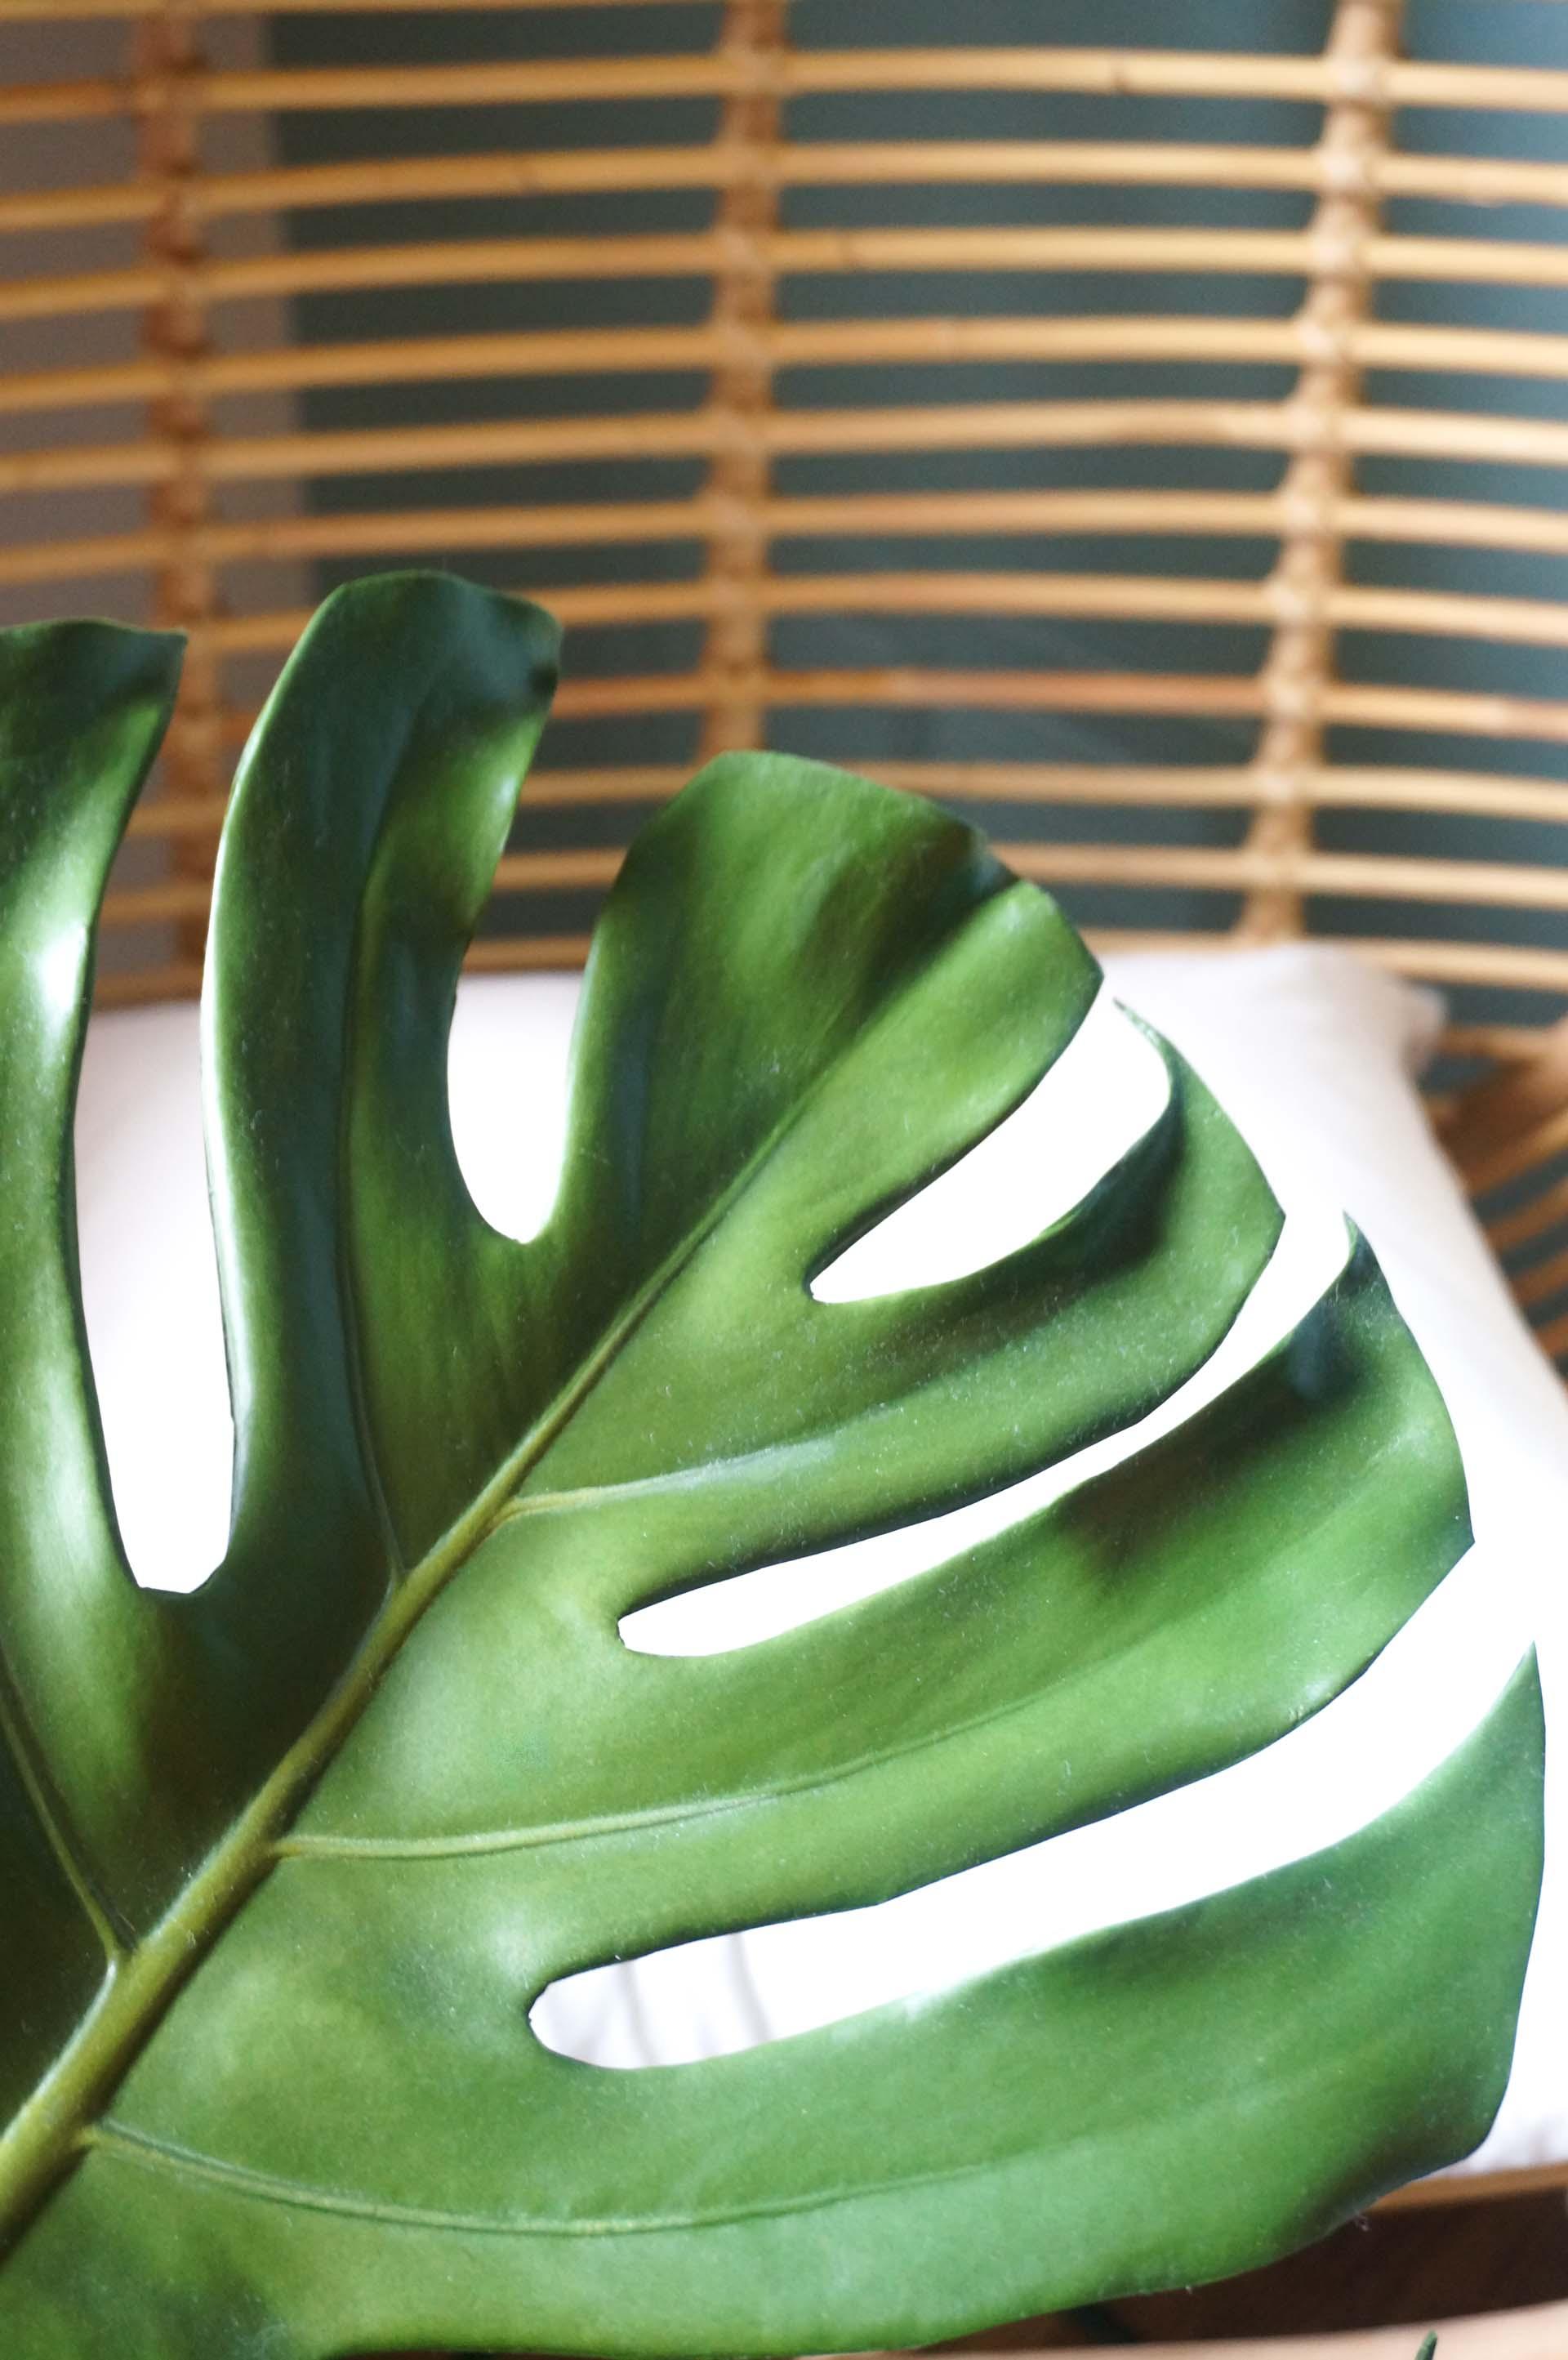 A monstera leaf adds a tropical vibe